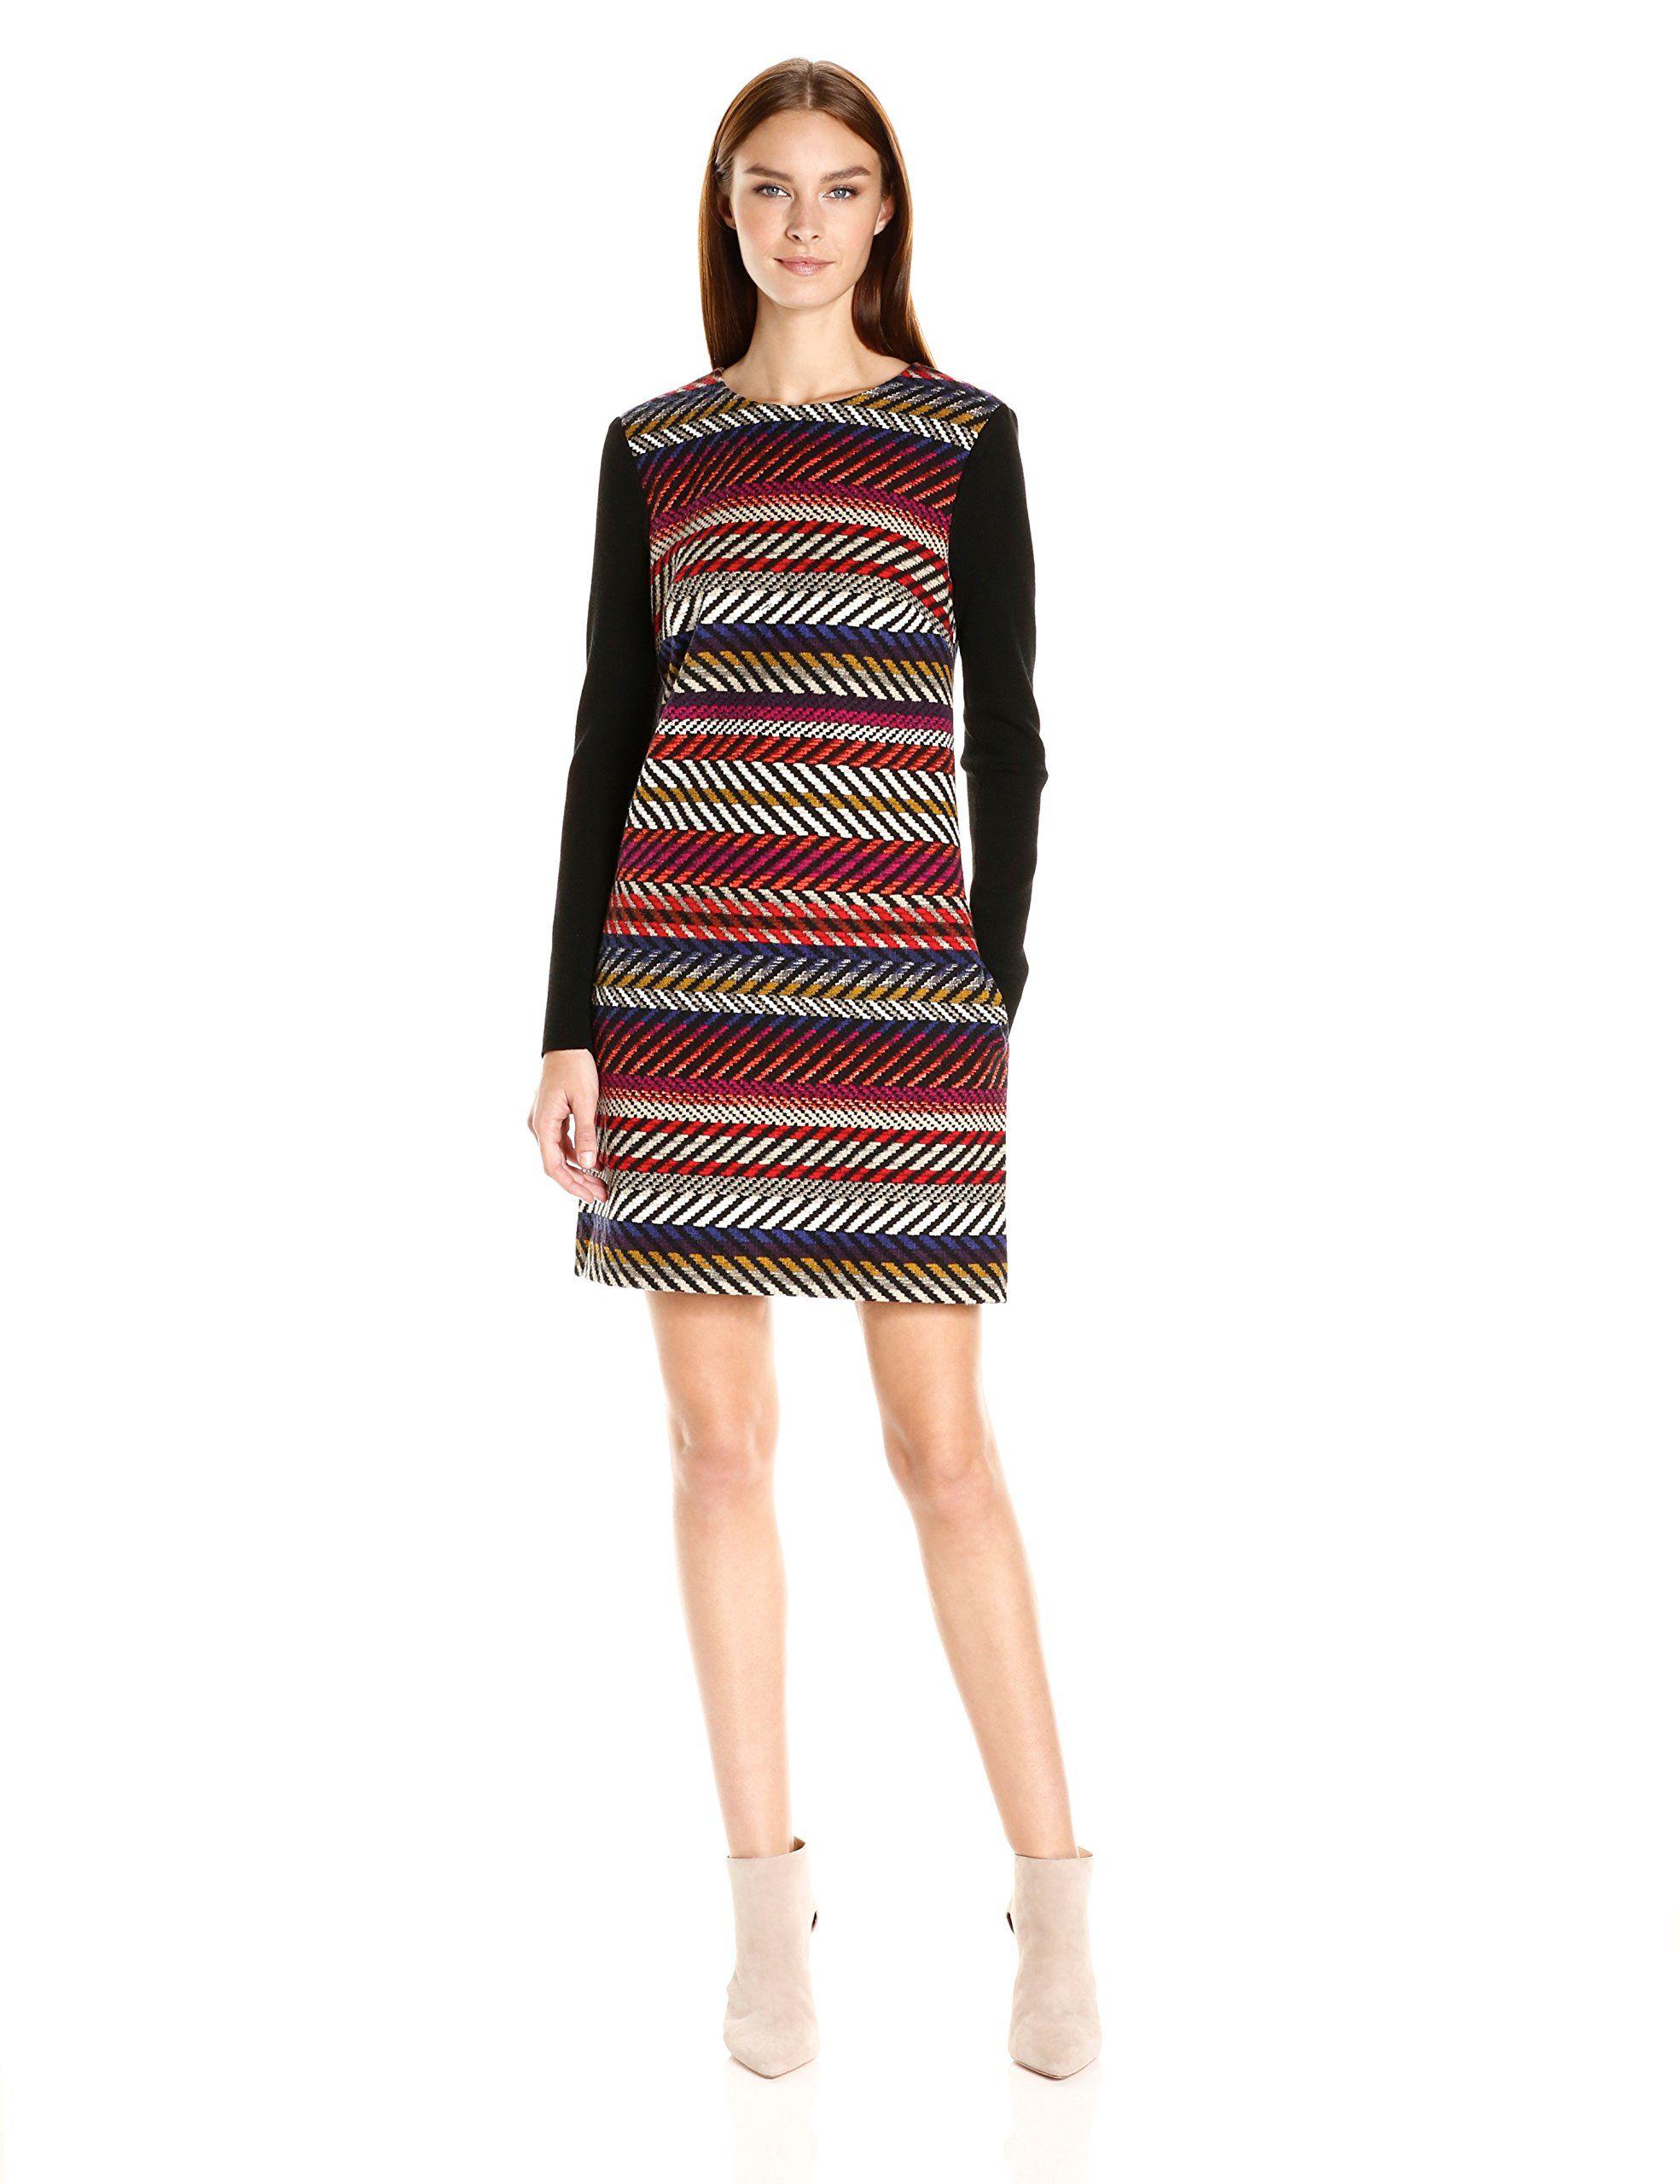 Trina turk womenus chapin kingscote stripe long sleeve dress multi